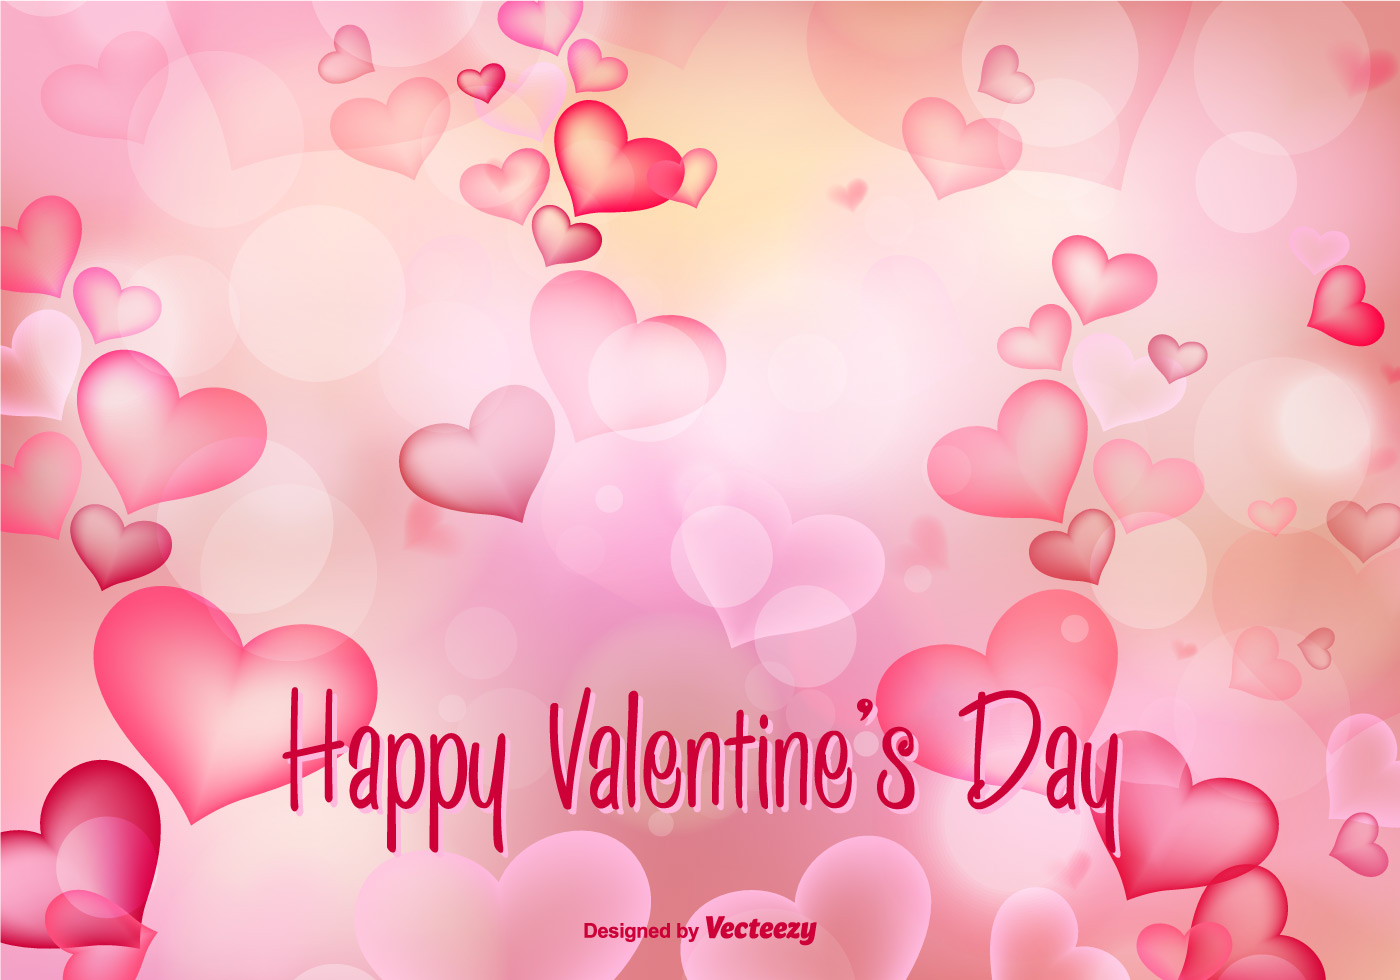 beautiful valentine 39 s day vector illustration download. Black Bedroom Furniture Sets. Home Design Ideas